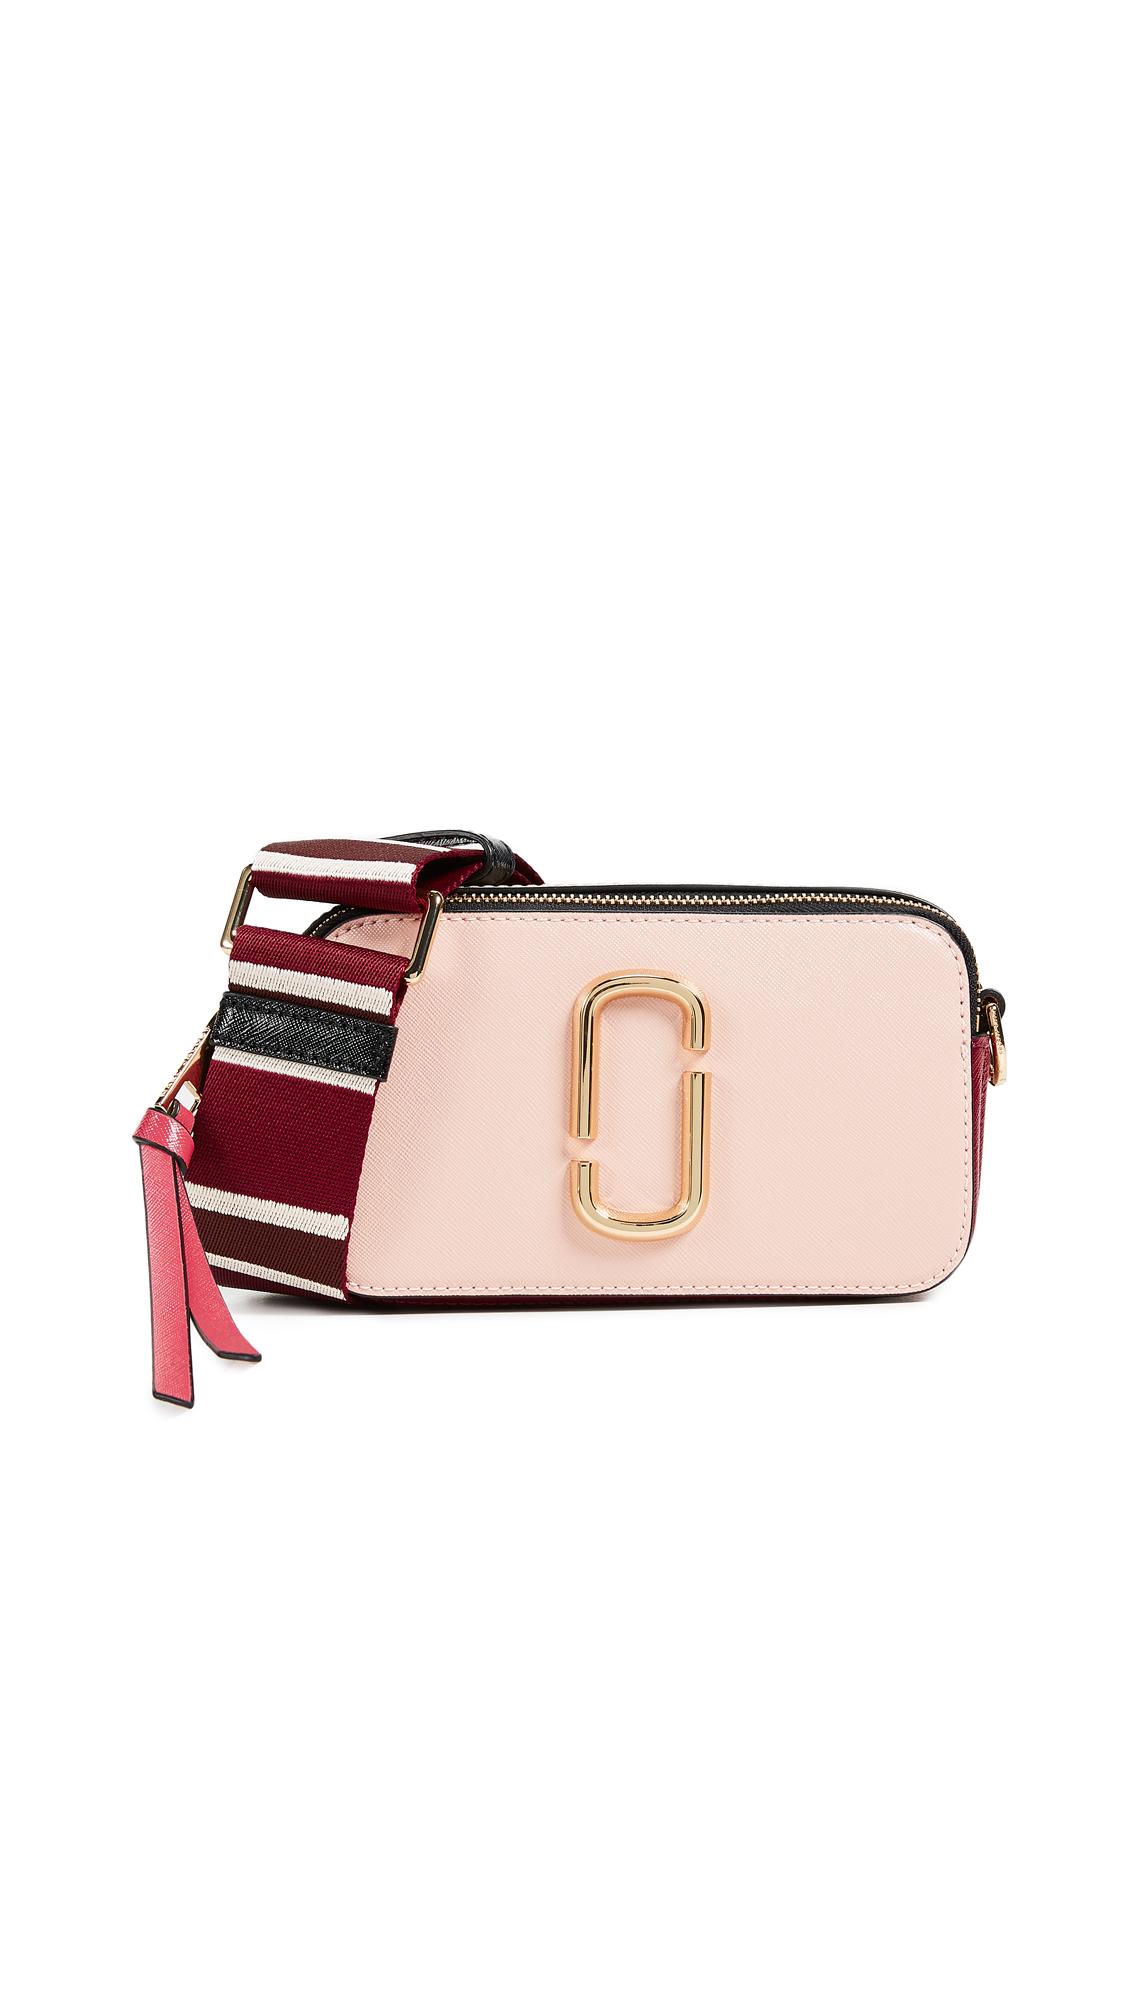 Marc Jacobs Snapshot Camera Bag - Rose